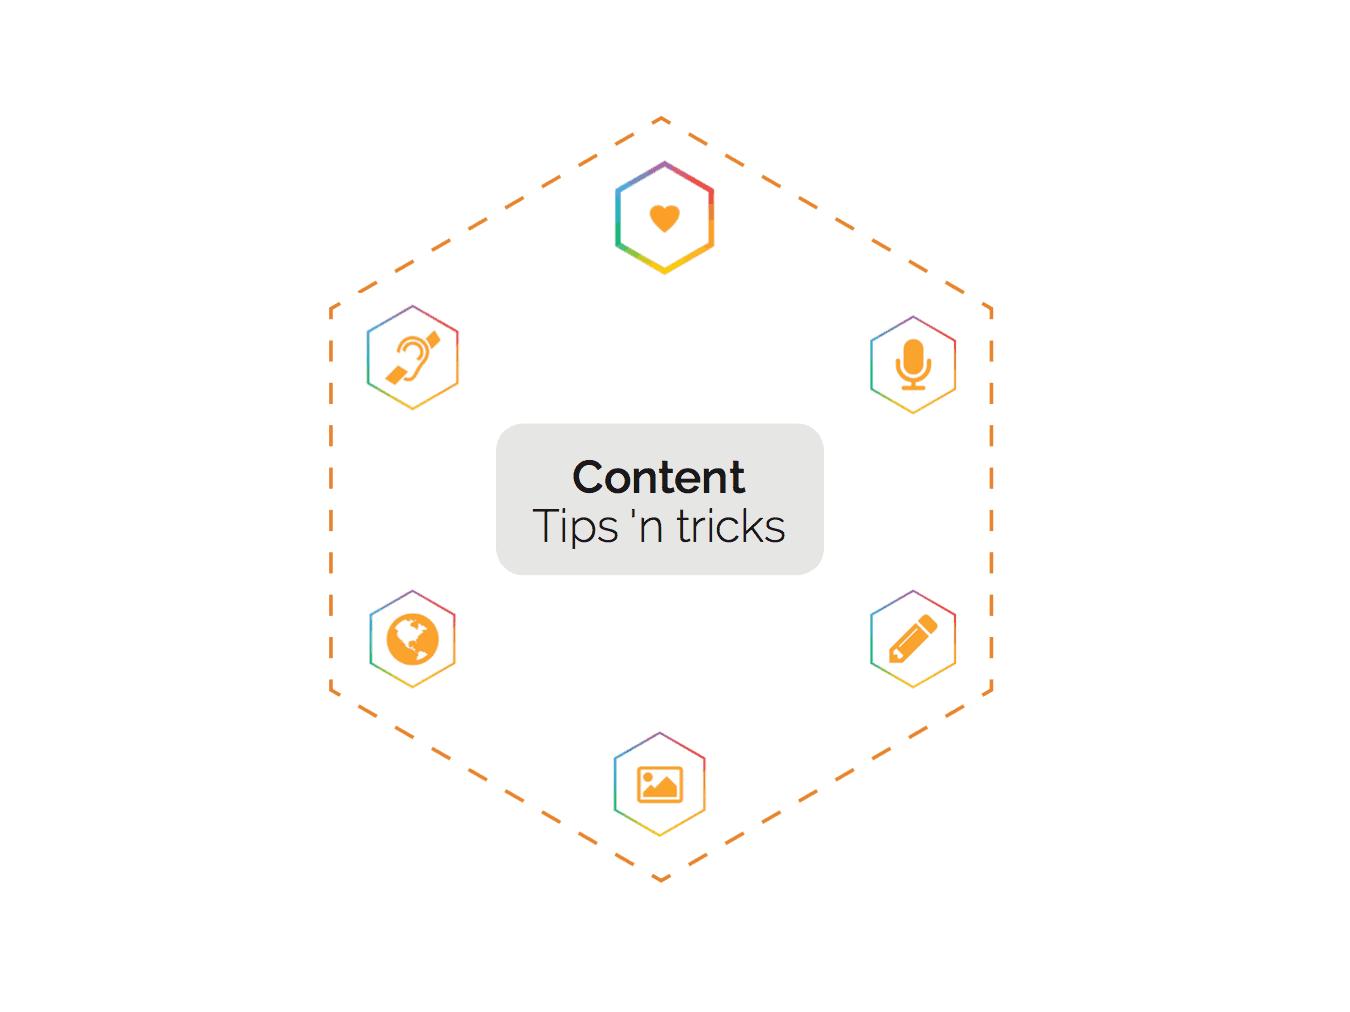 symbols for content